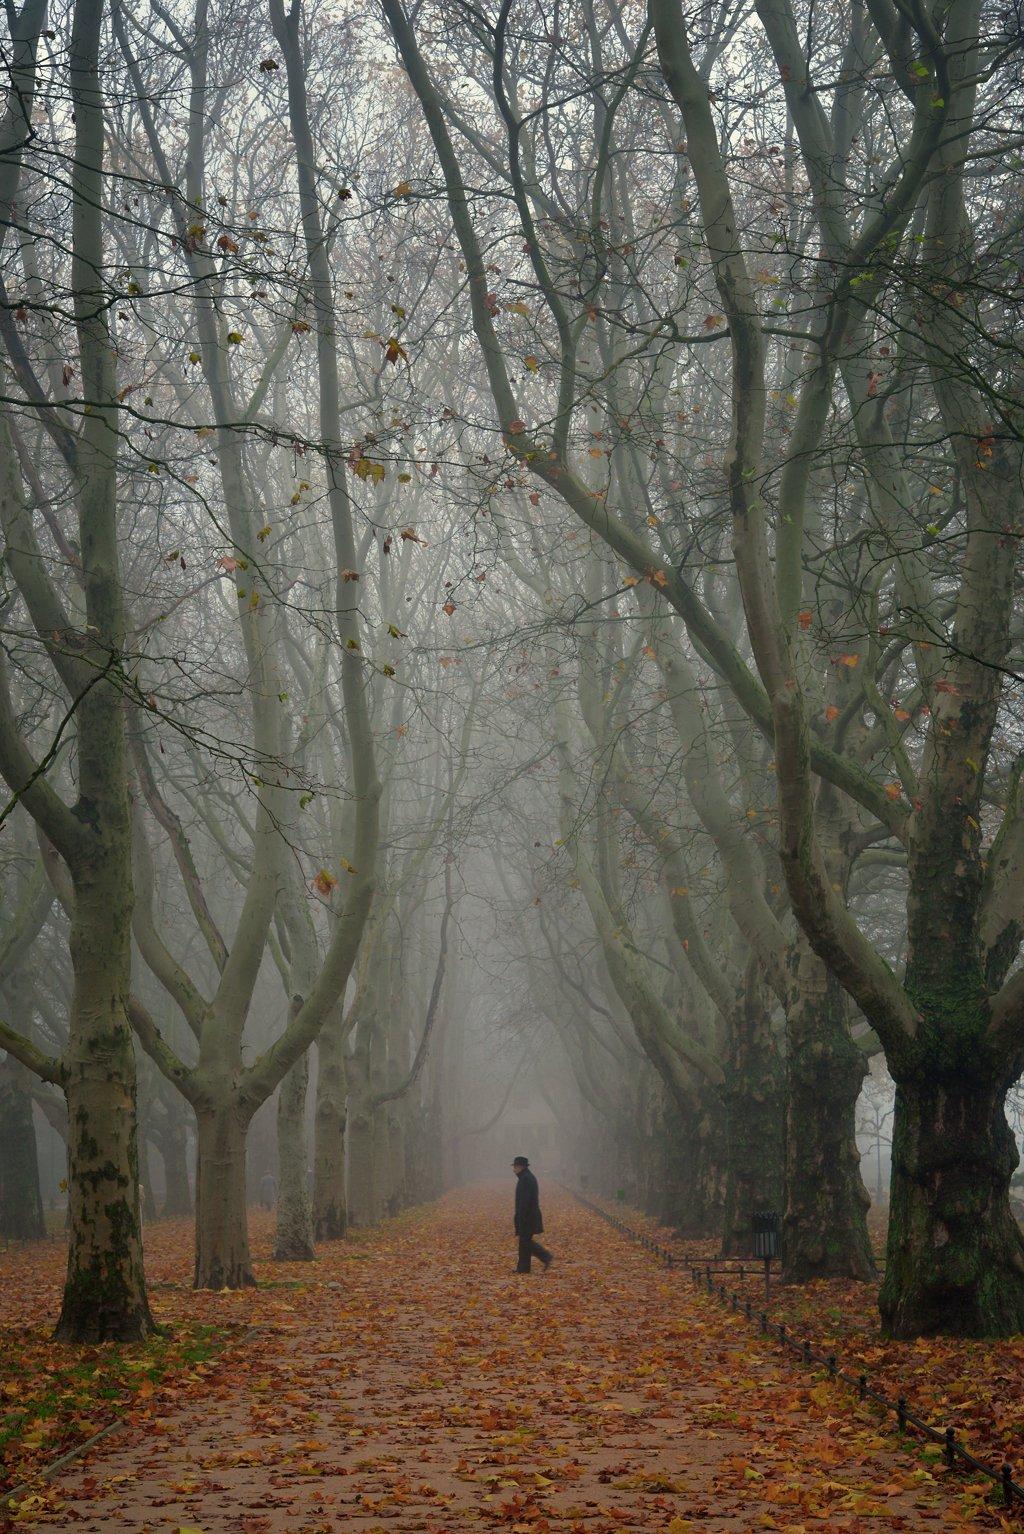 детектив walk autumn fall alley trees path road poland tree mist foggy morning, Radoslaw Dranikowski